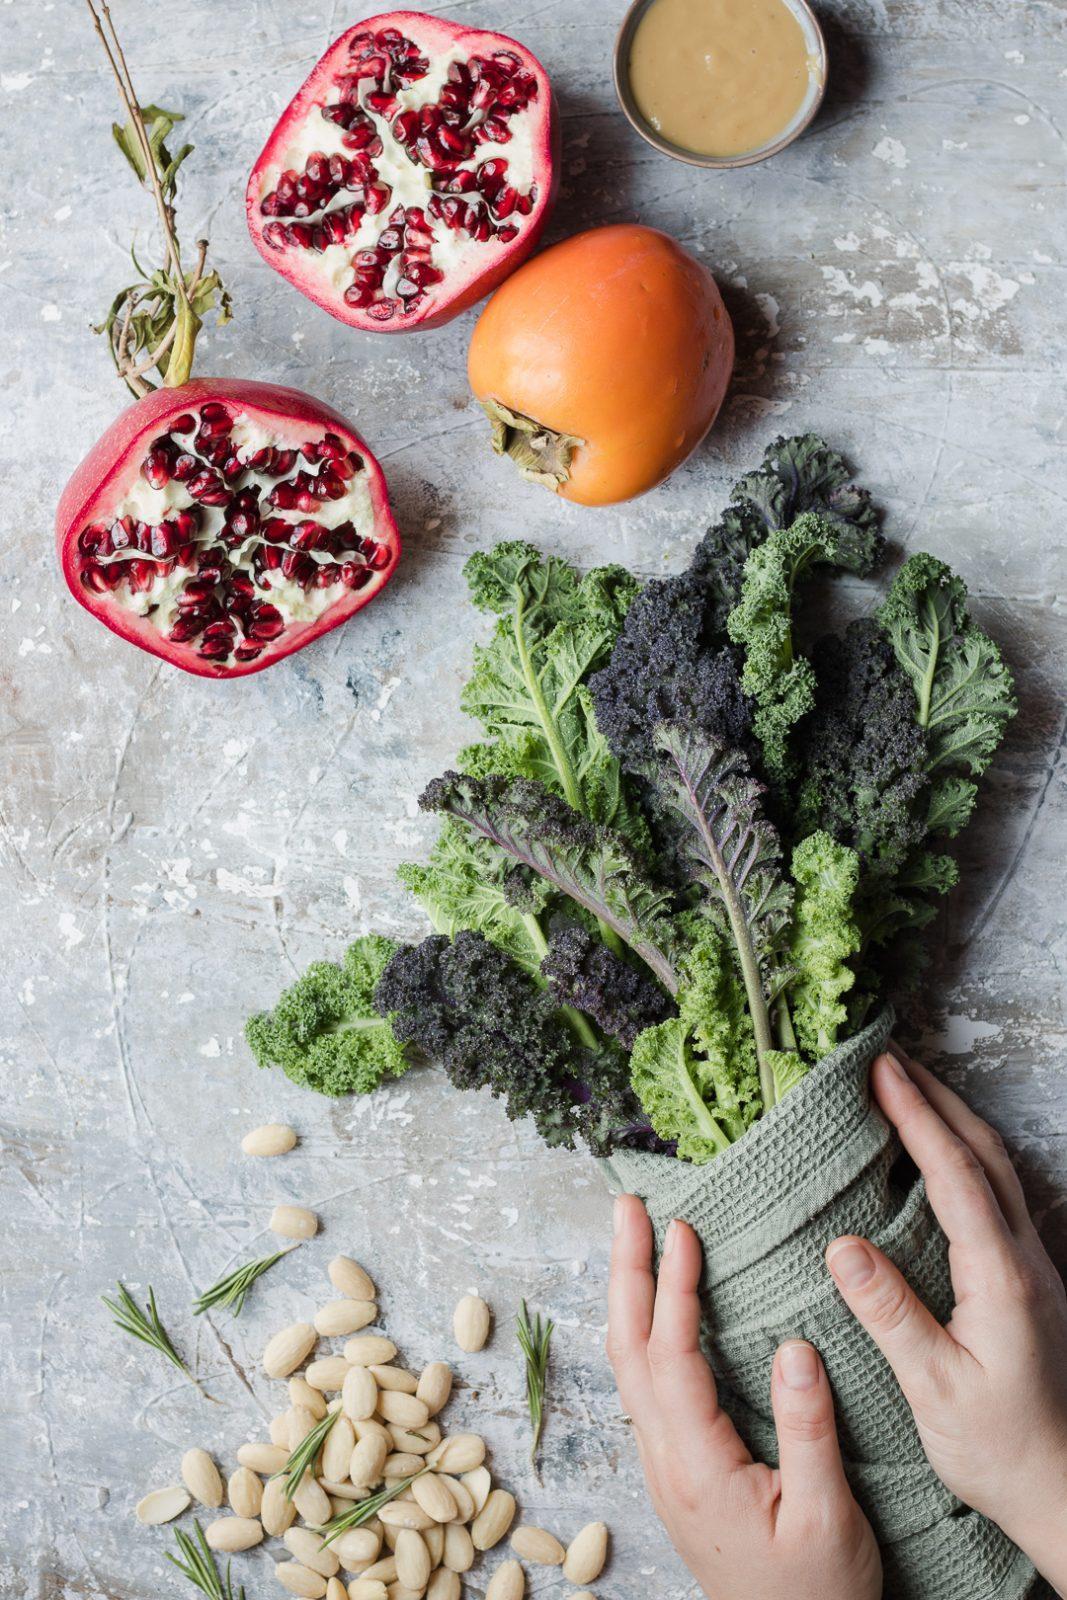 Kale, melograno, caco mela e mandorle